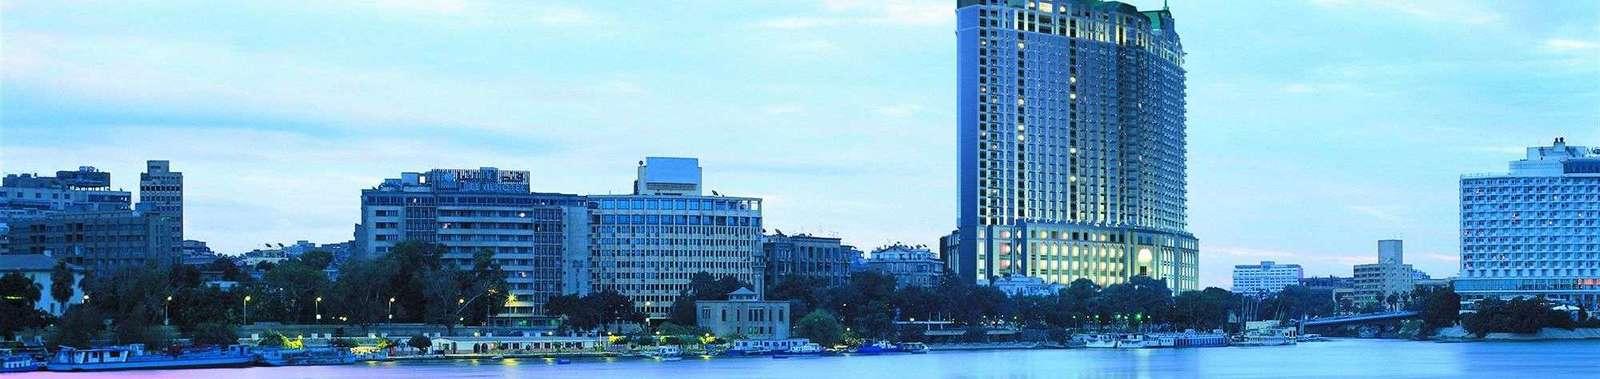 four-seasons-hotel-cairo-nile-plaza-1